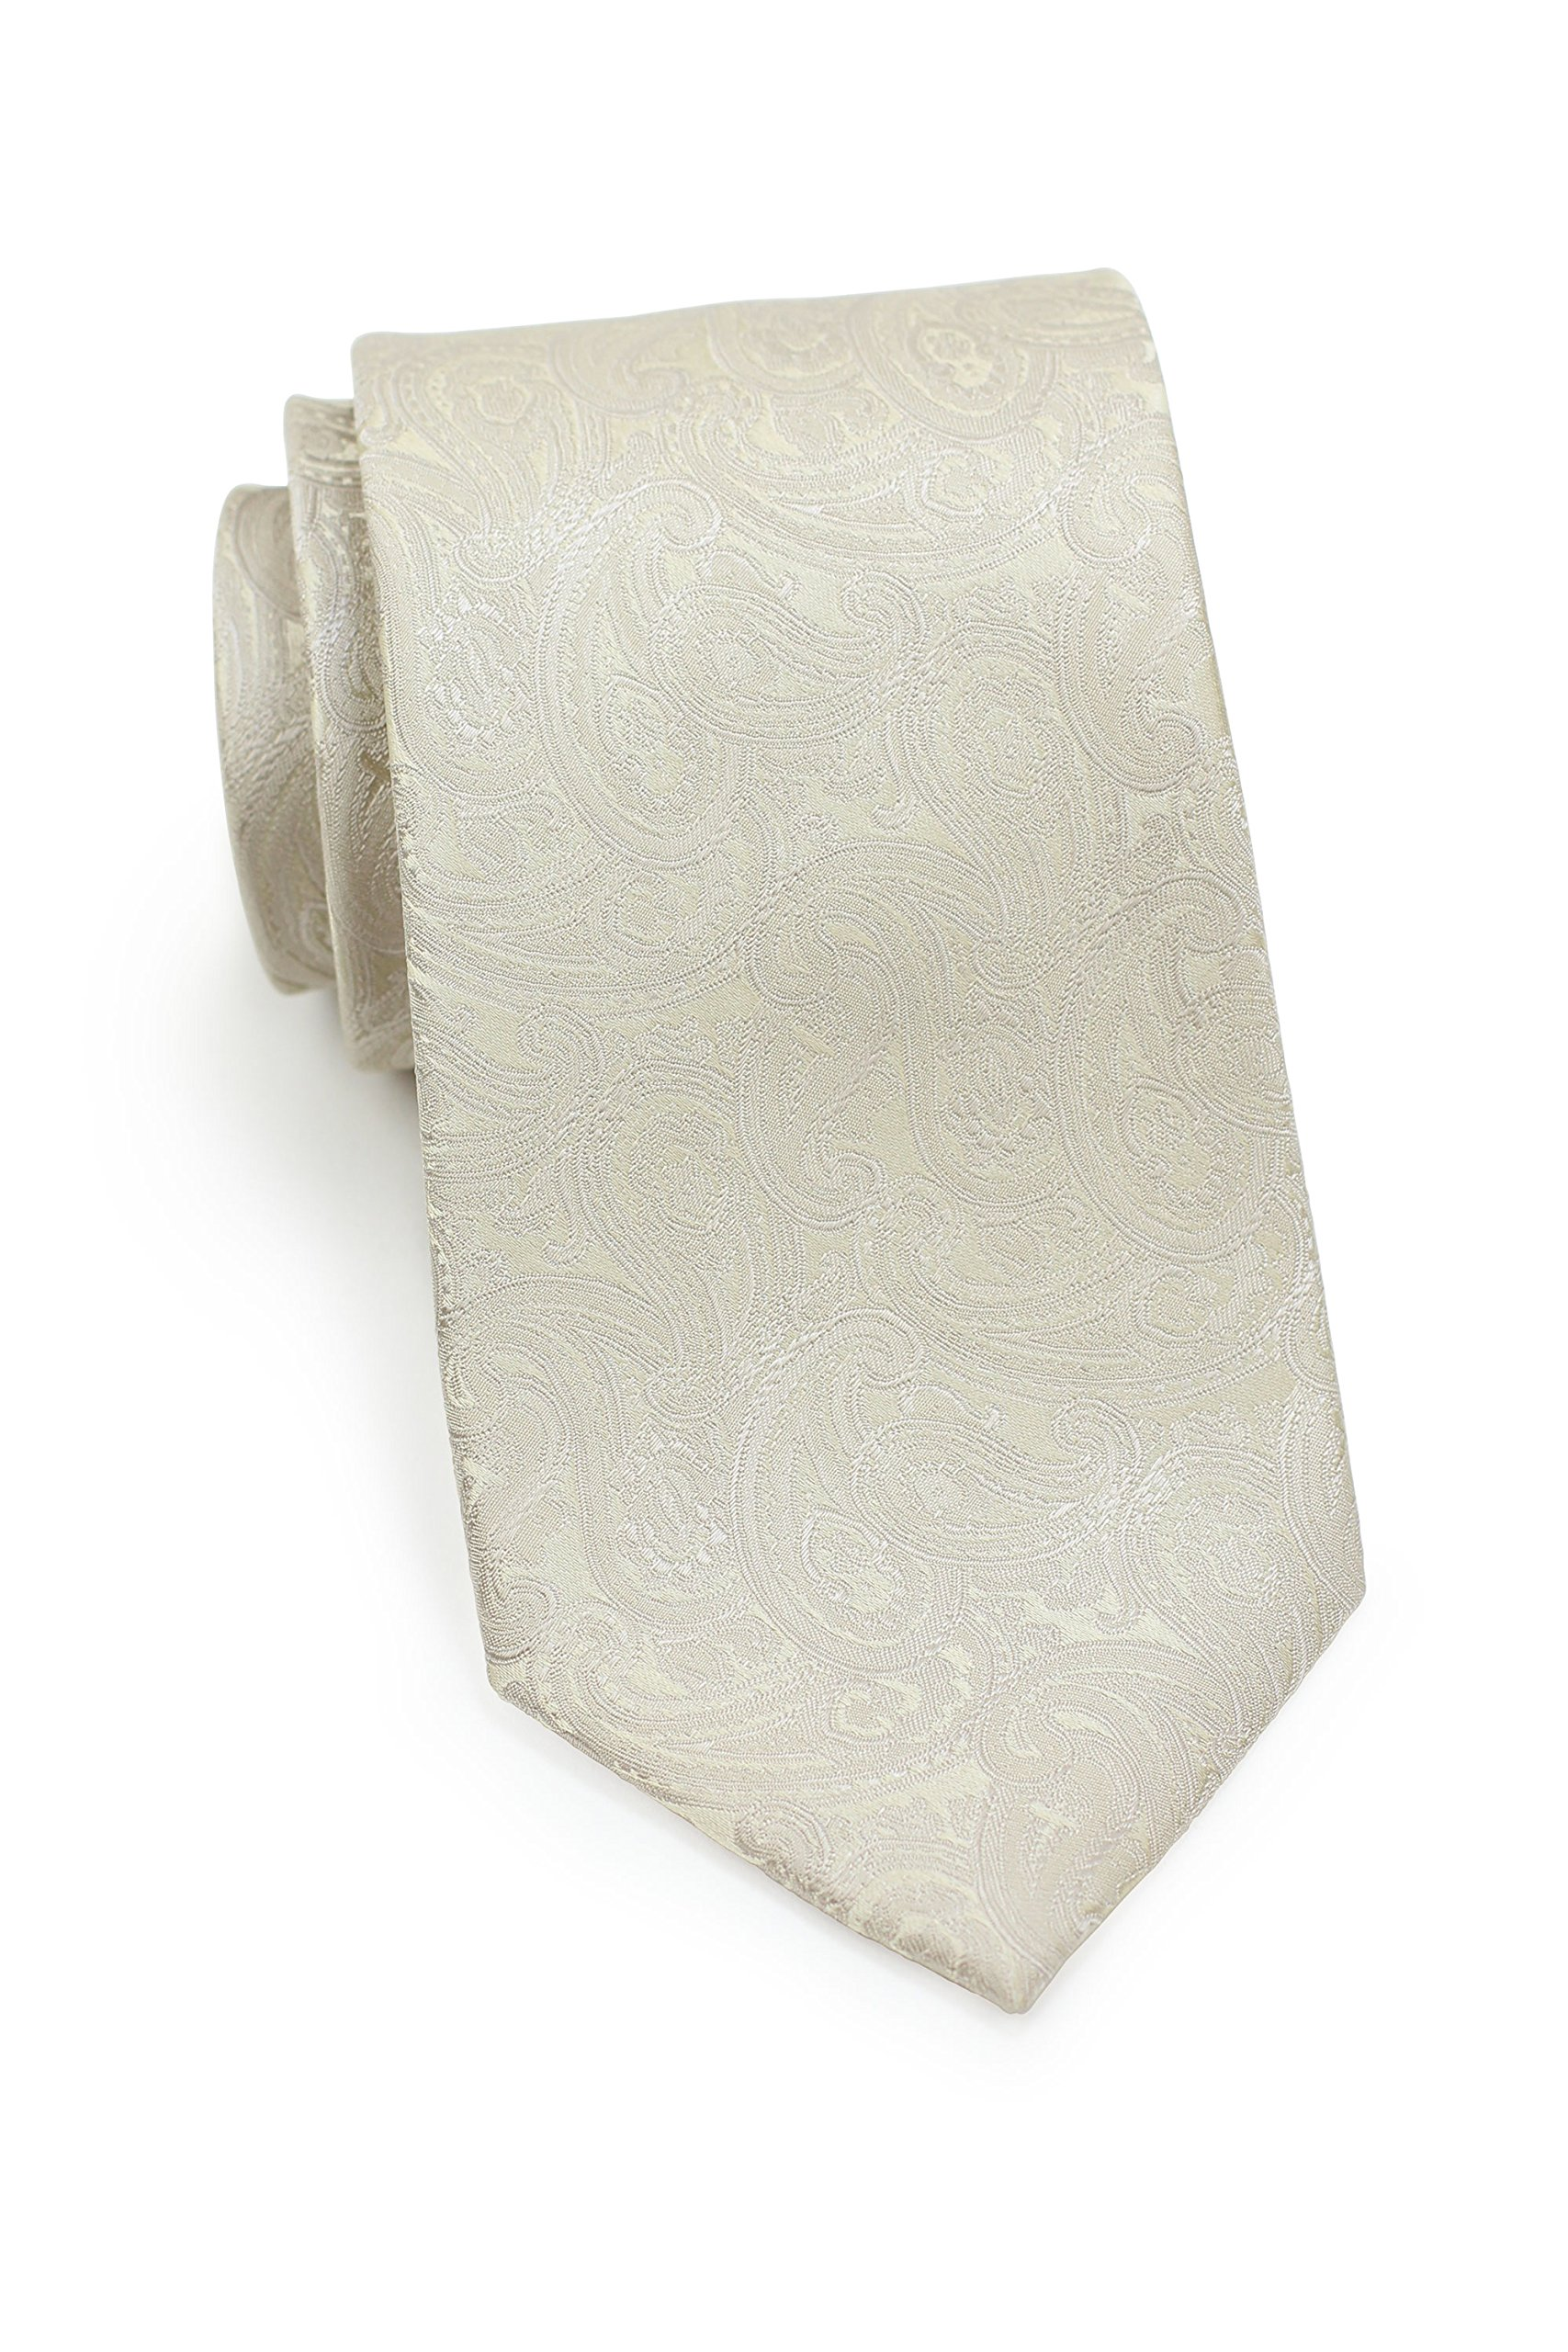 CDM product Bows-N-Ties Men's Necktie Classic Wedding Silk Satin Tie 3.25 Inches big image